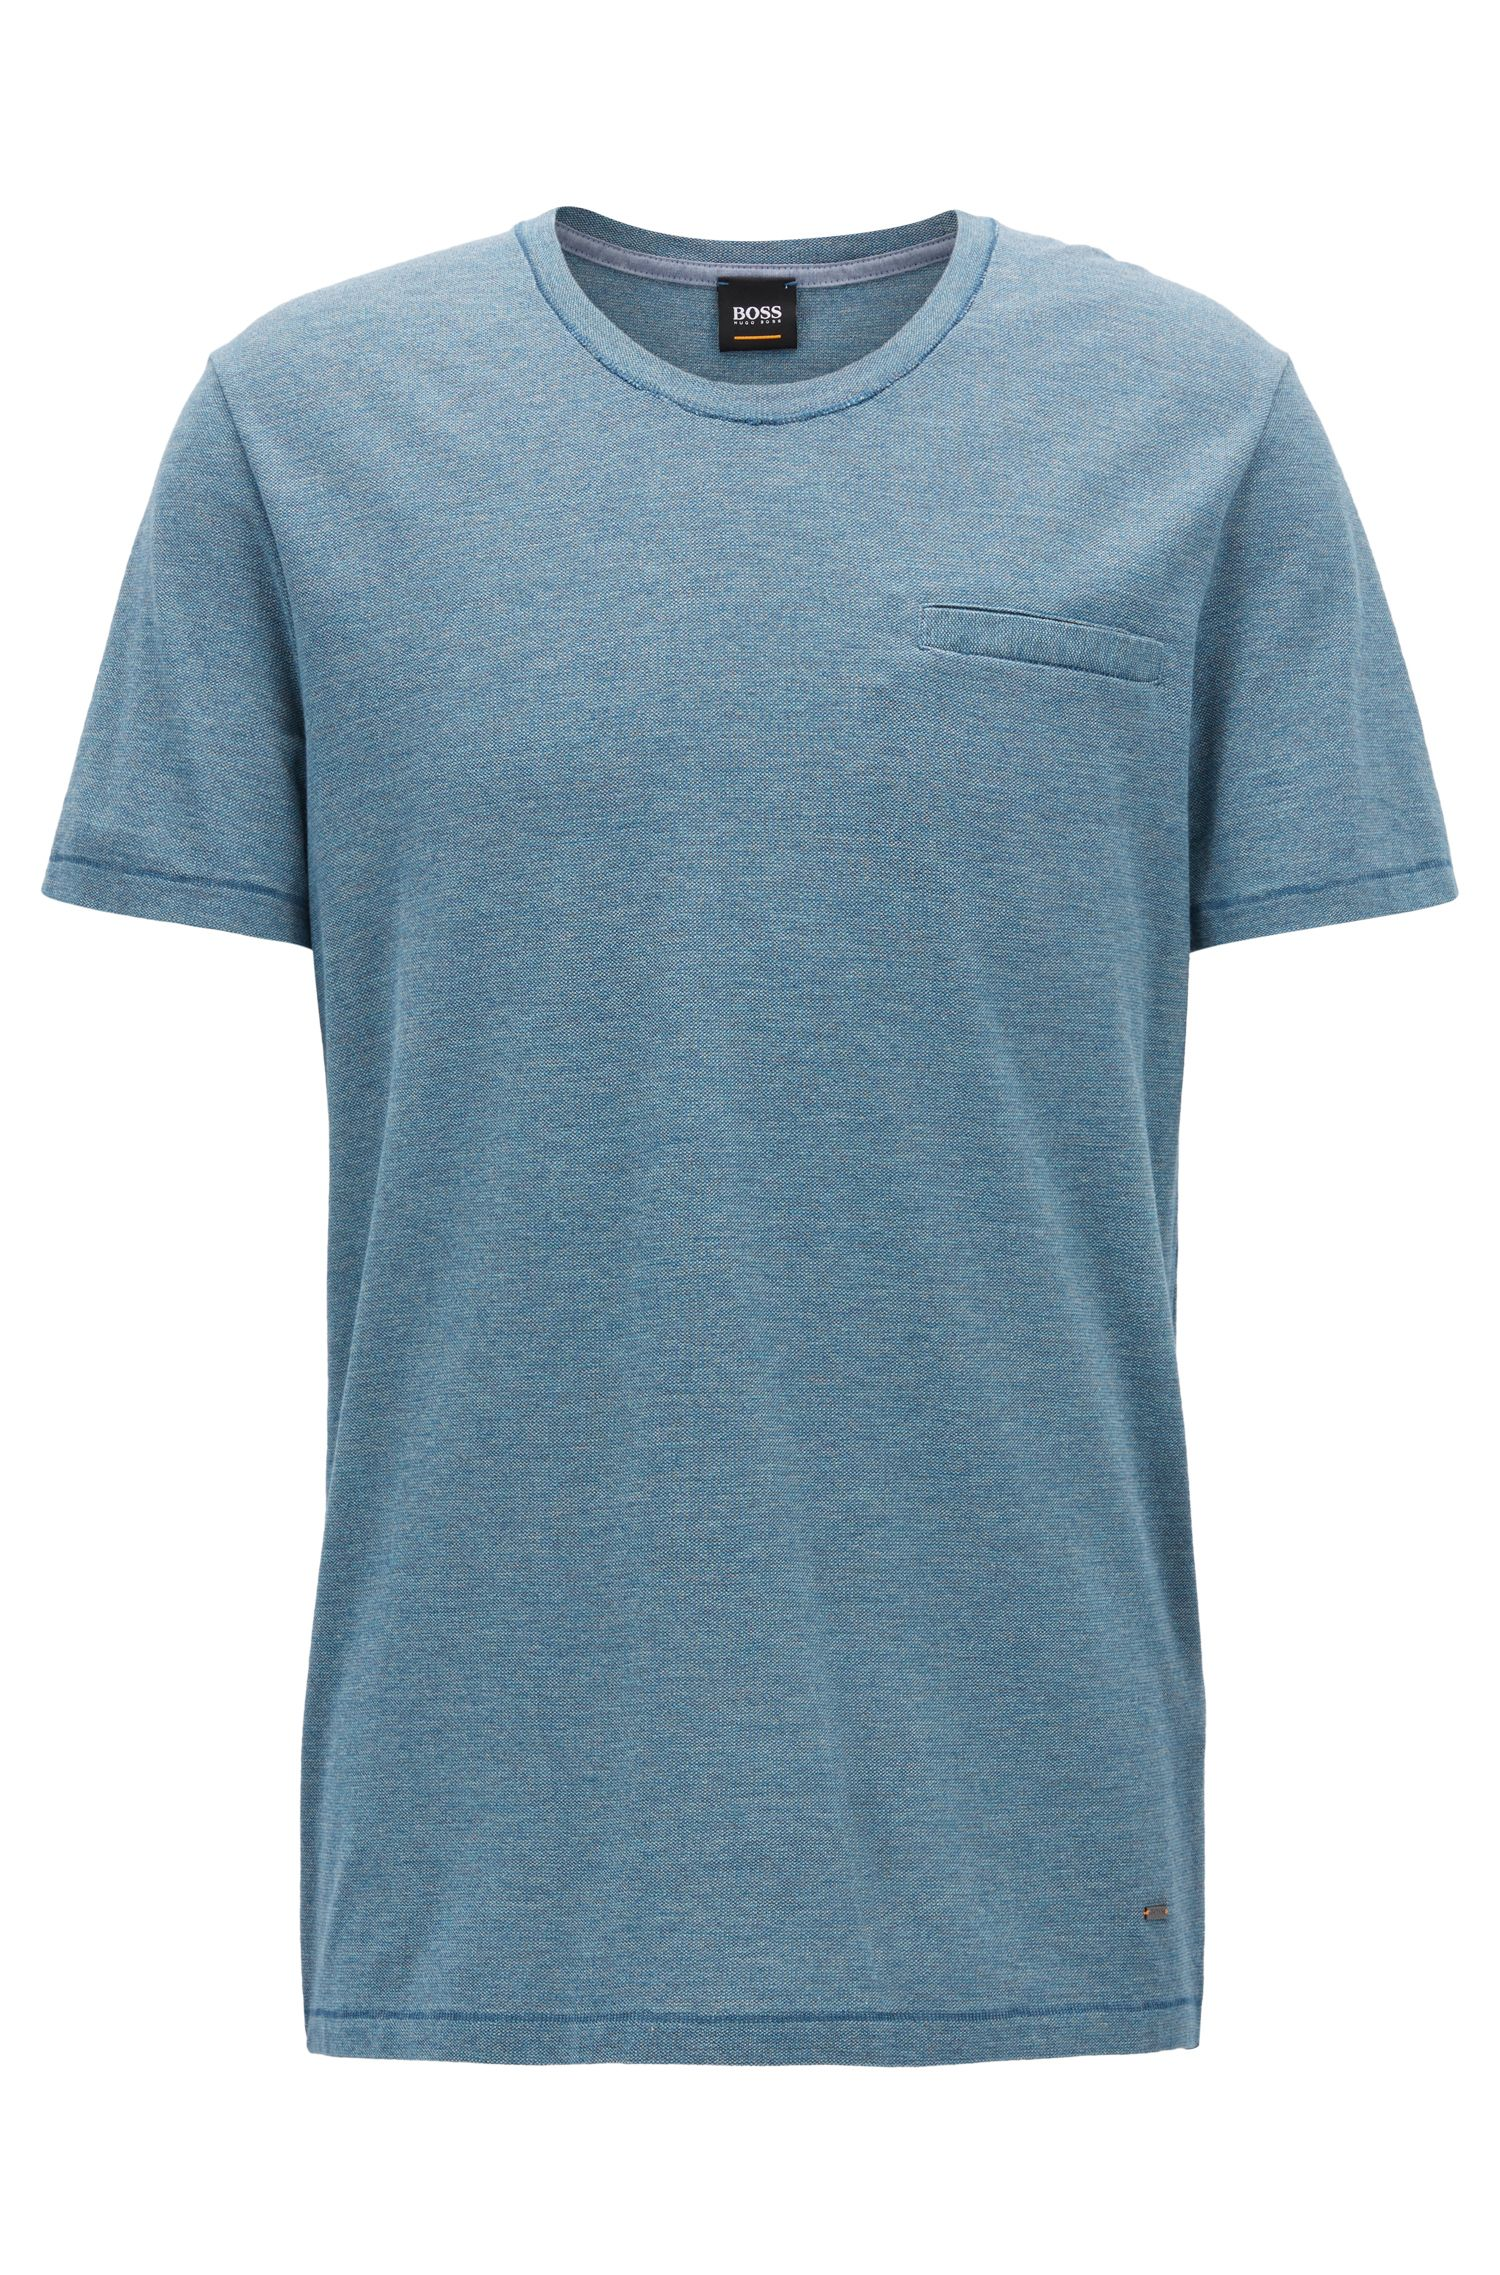 Camiseta de cuello redondo en algodón mouliné teñido en hilo